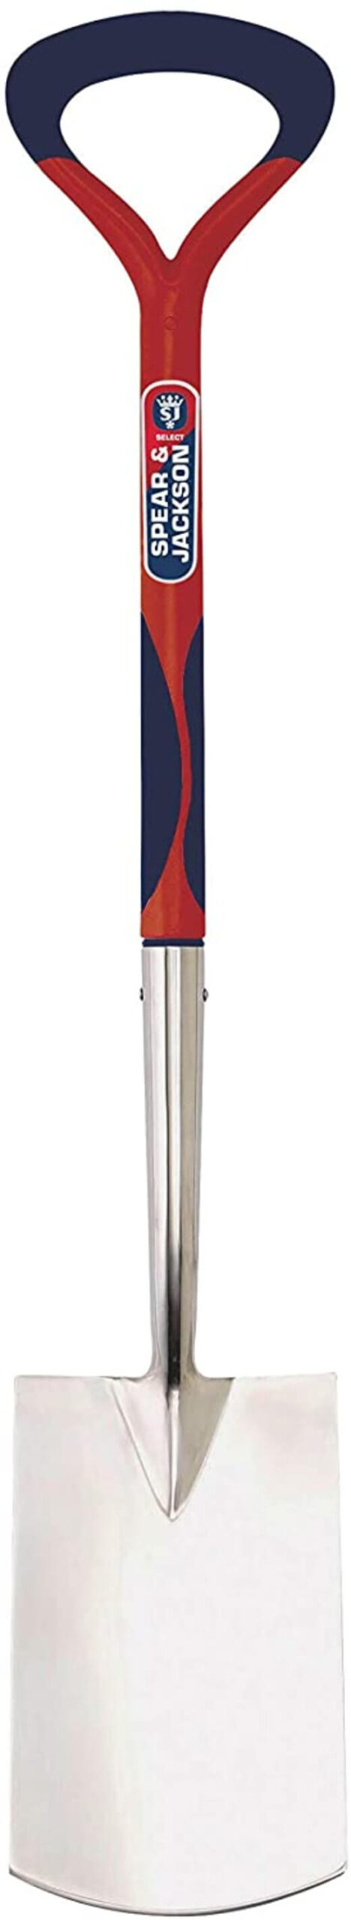 SPEAR & JACKSON Garden Spade - Stainless Steel Blade, Ergonomic Shaft & D-Handles SJ-1190EL